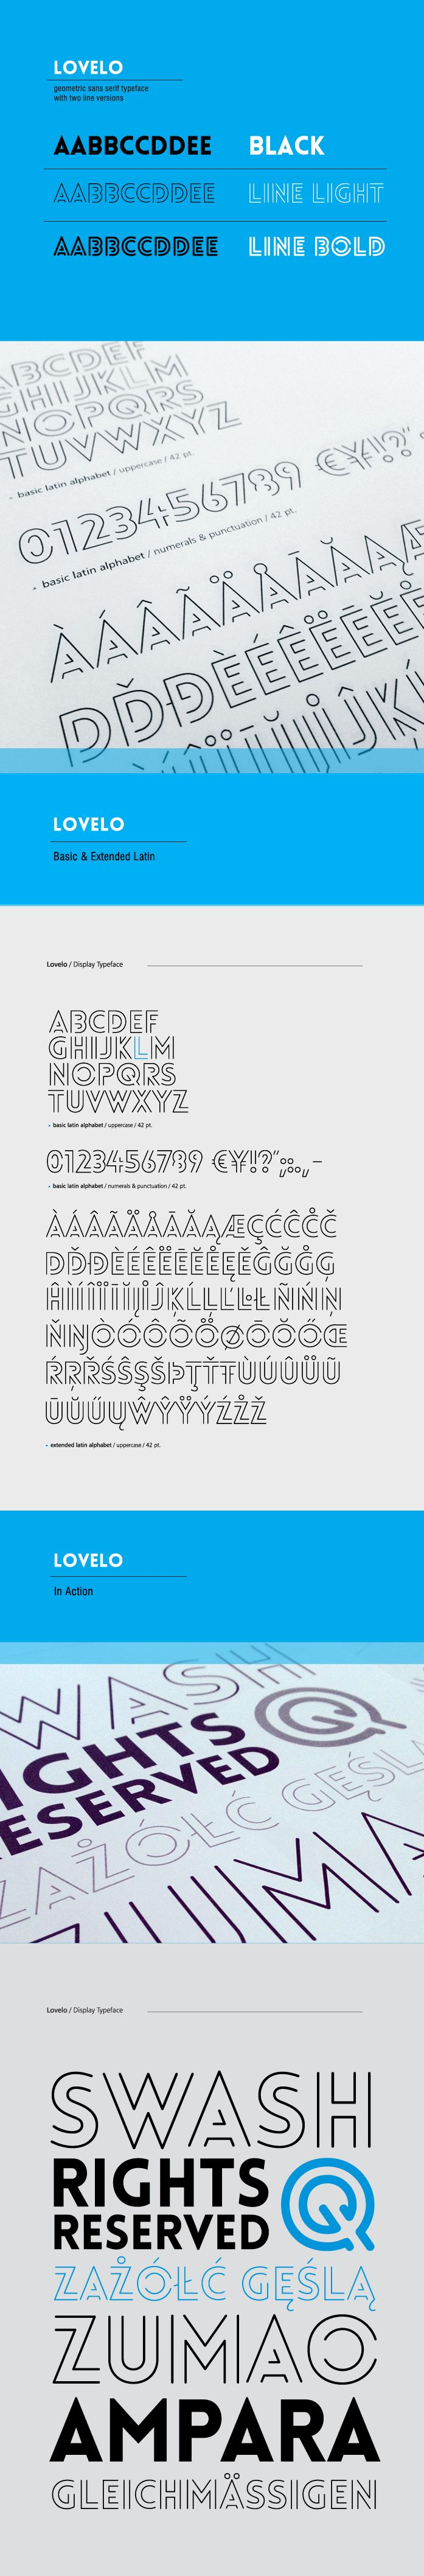 Lovelo font - Fontfabric